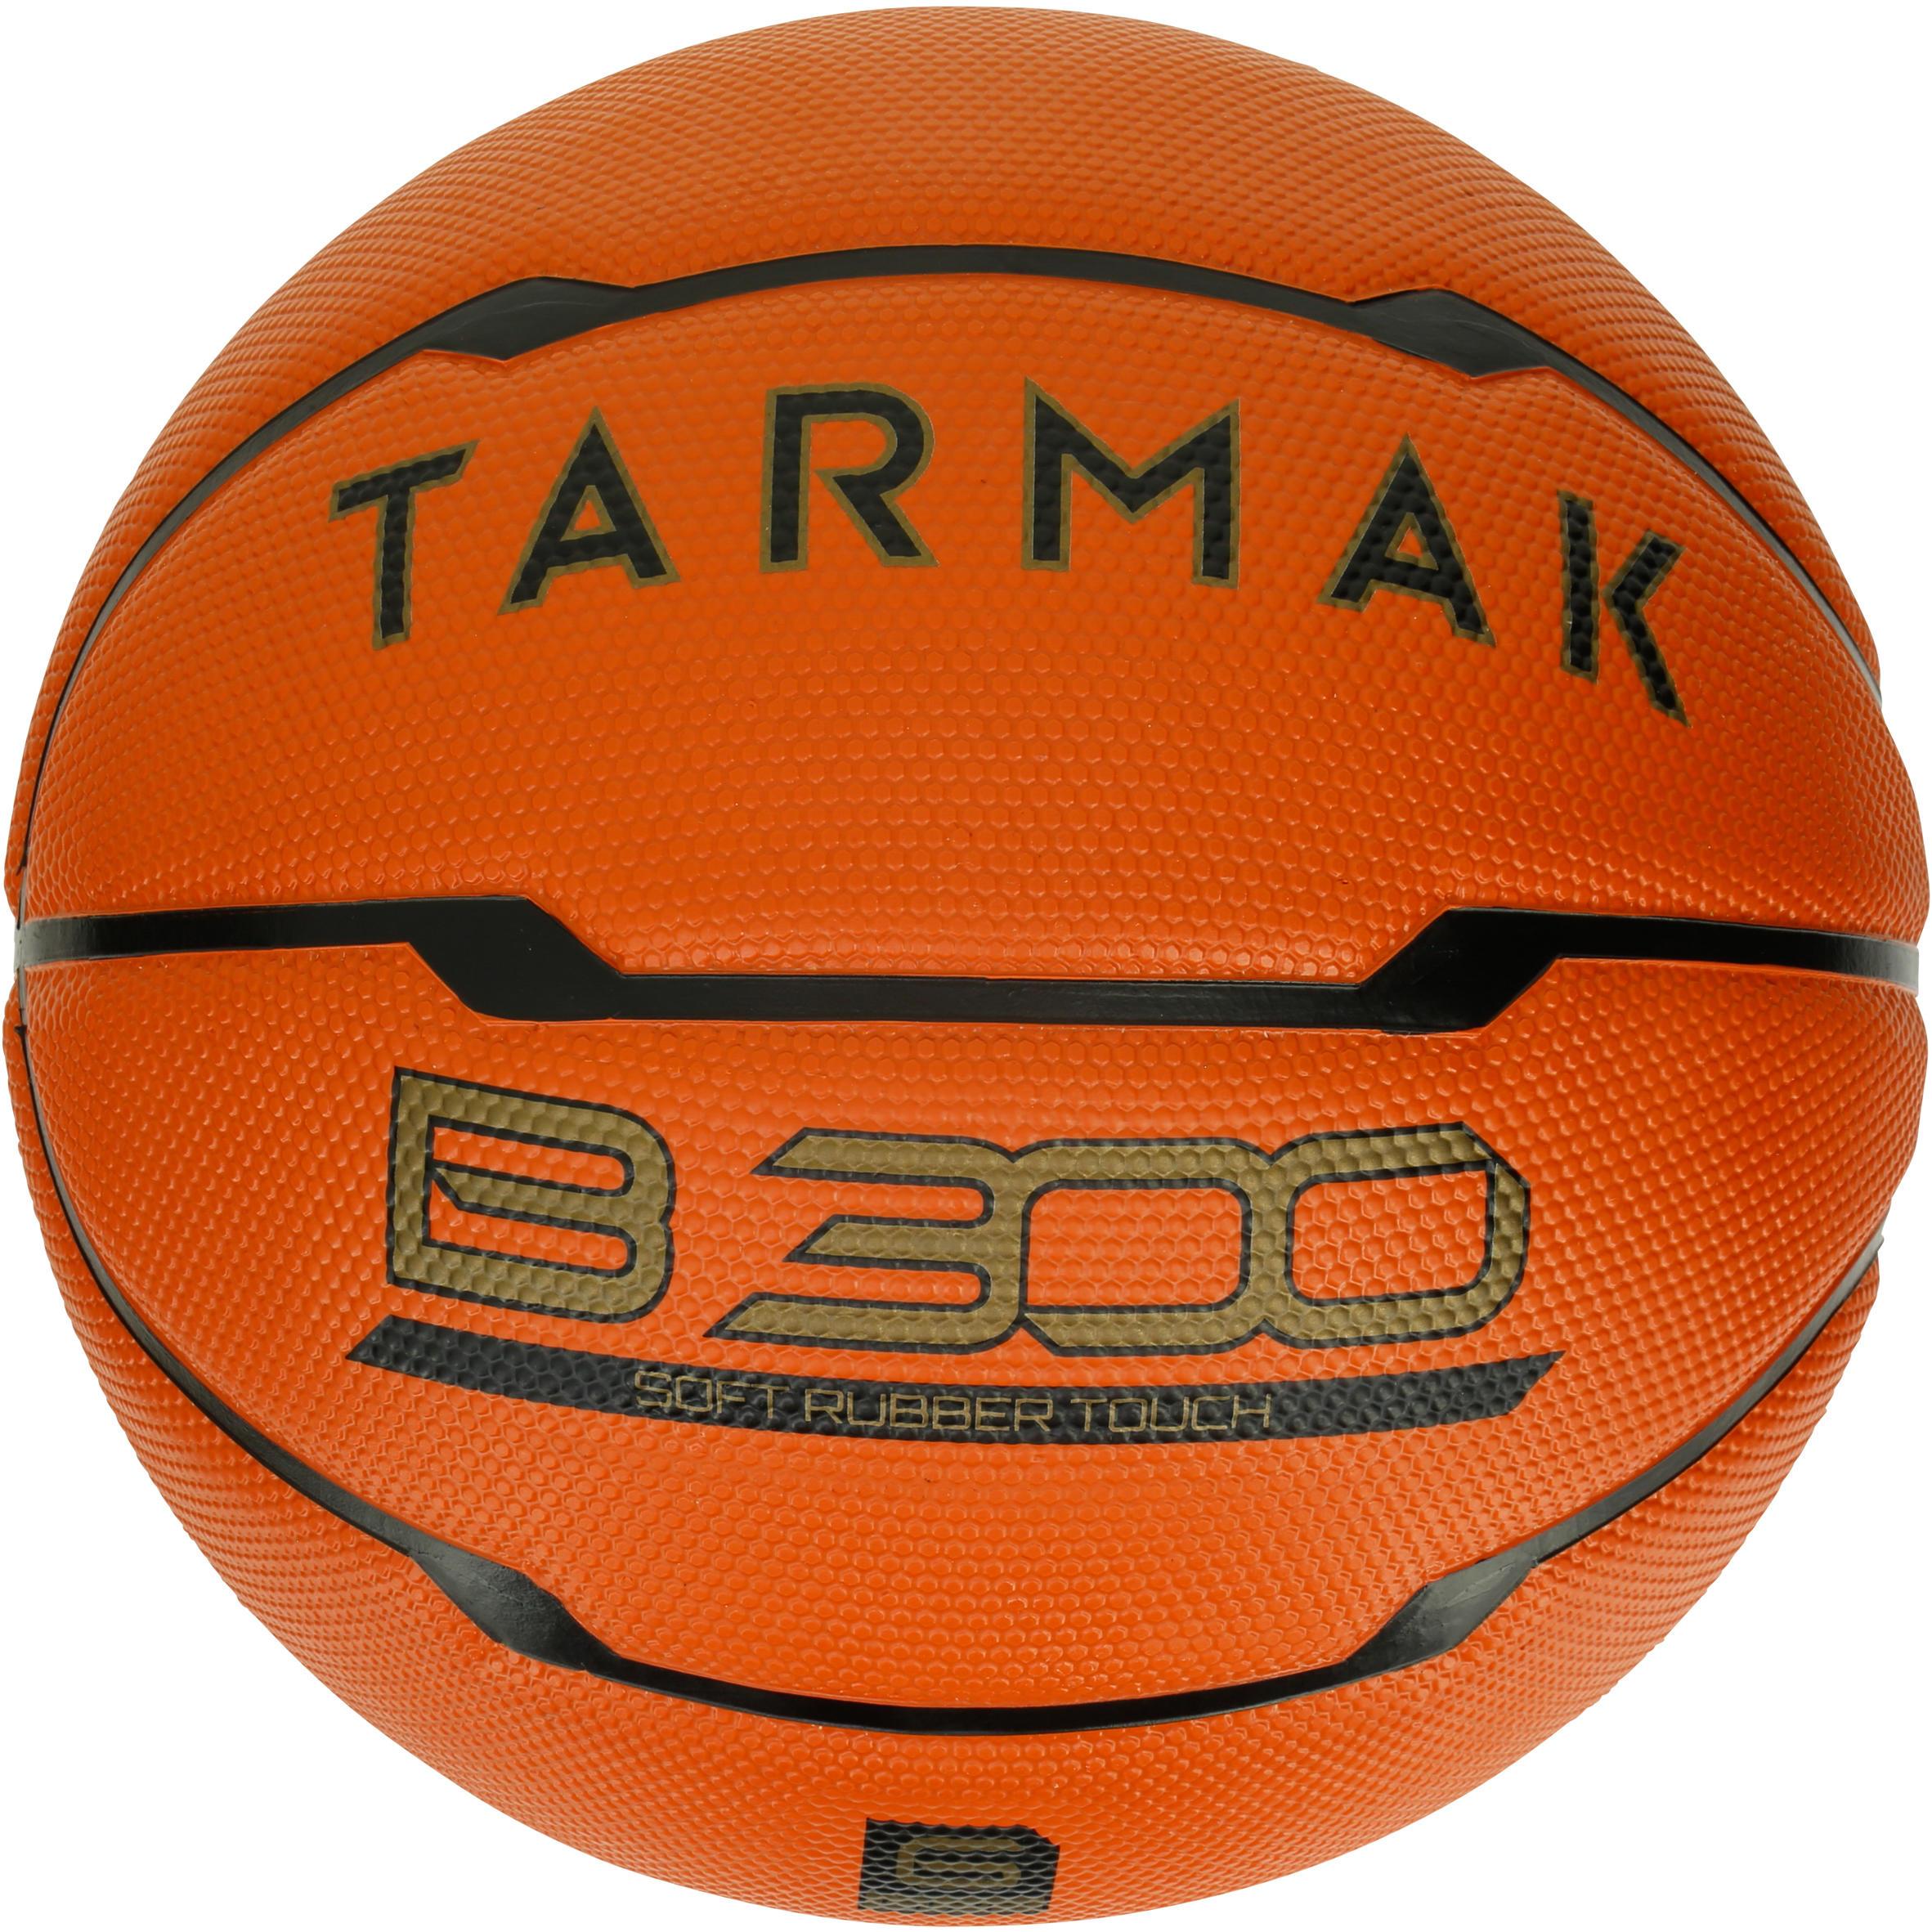 B300 Size 6 Basketball - Orange